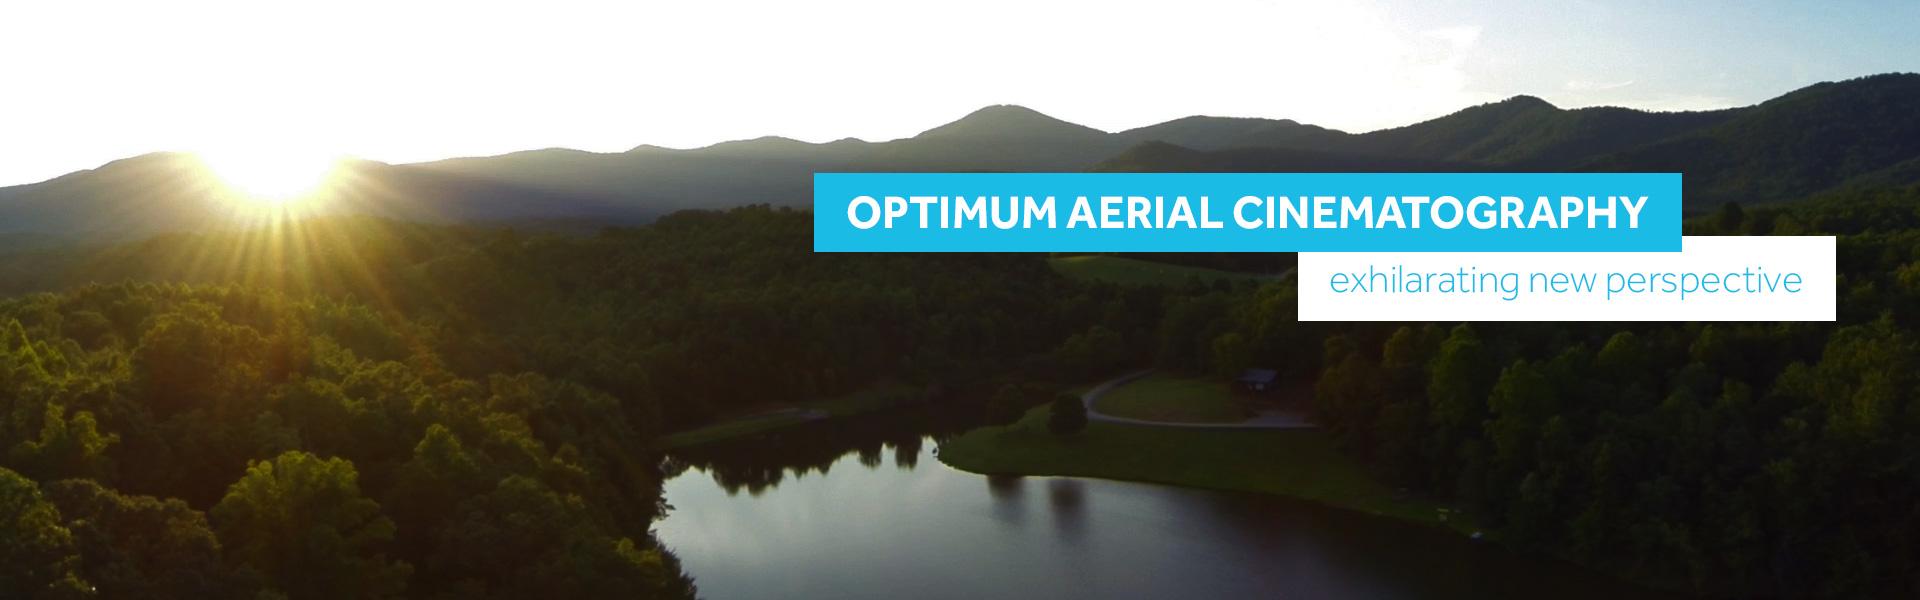 Aerial Cinematography in Atlanta Georgia: exhilarating new perspective